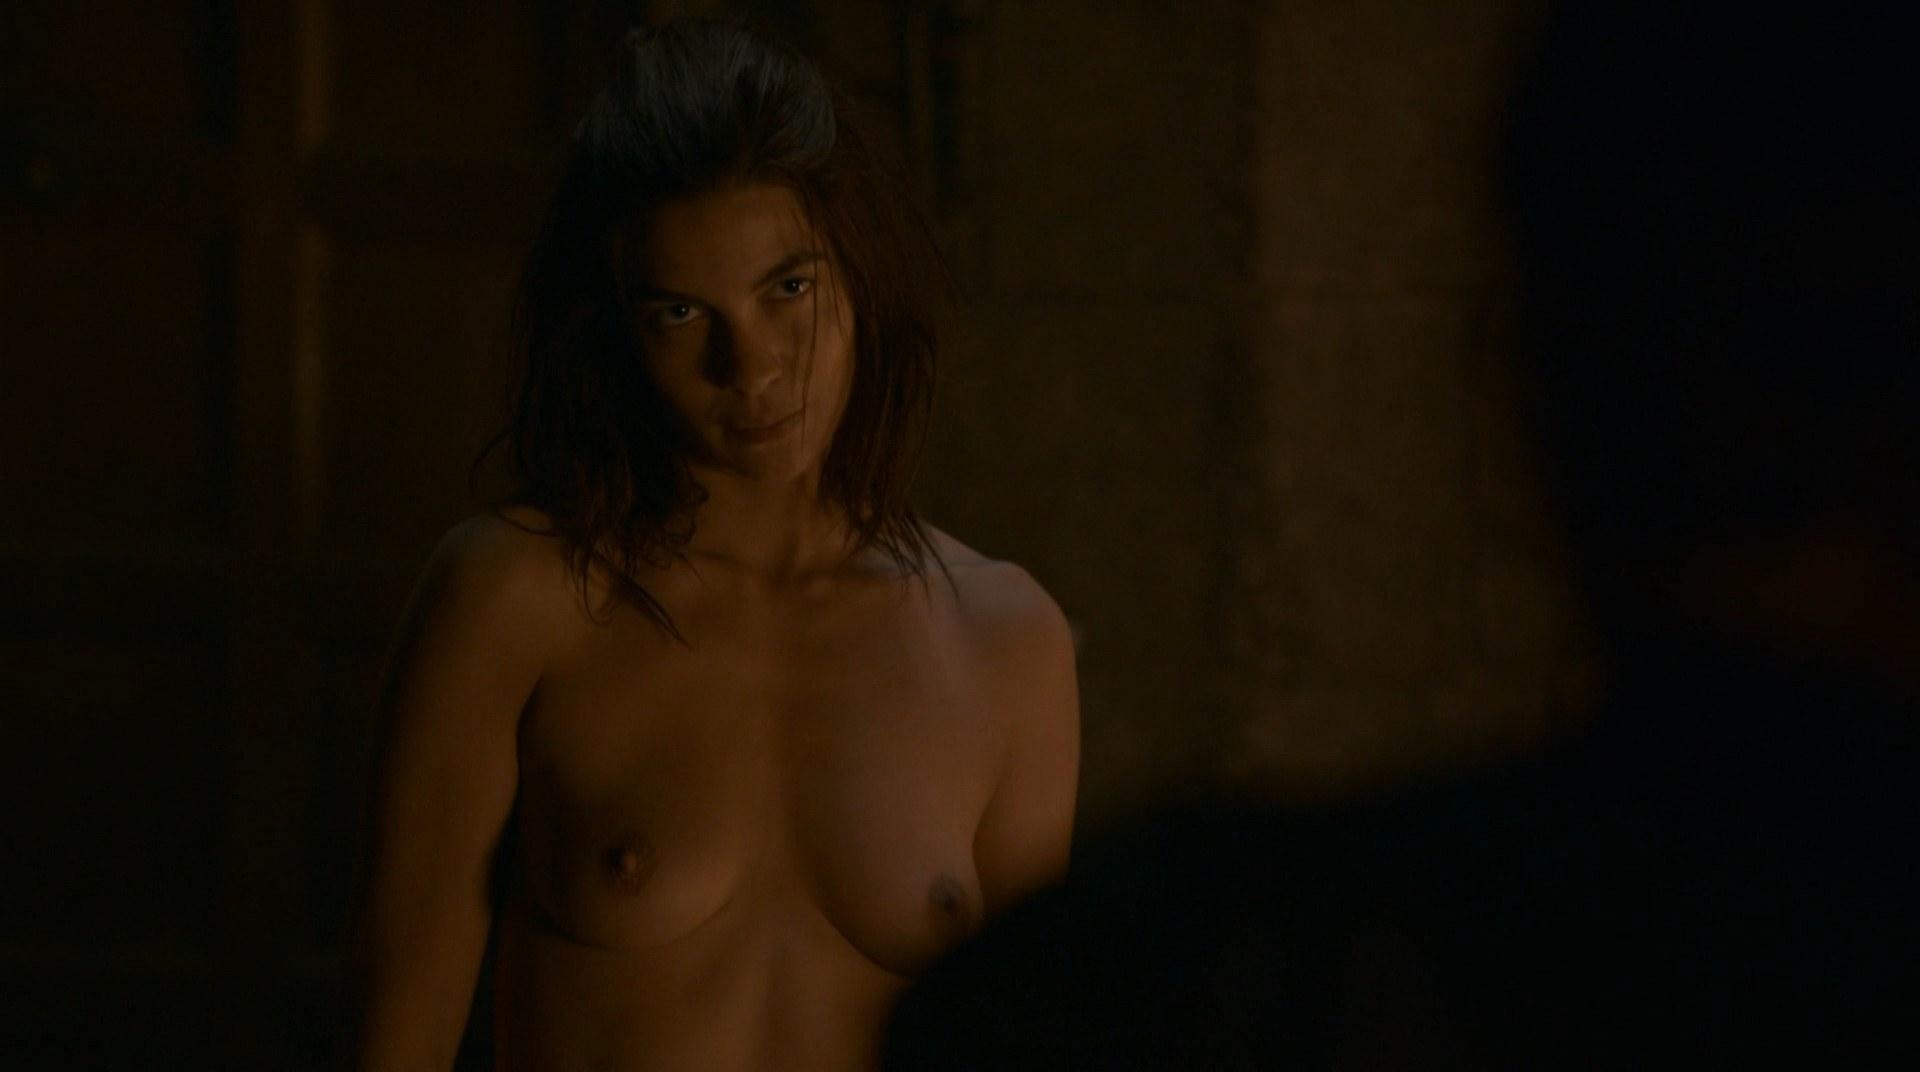 Crotch pics nude